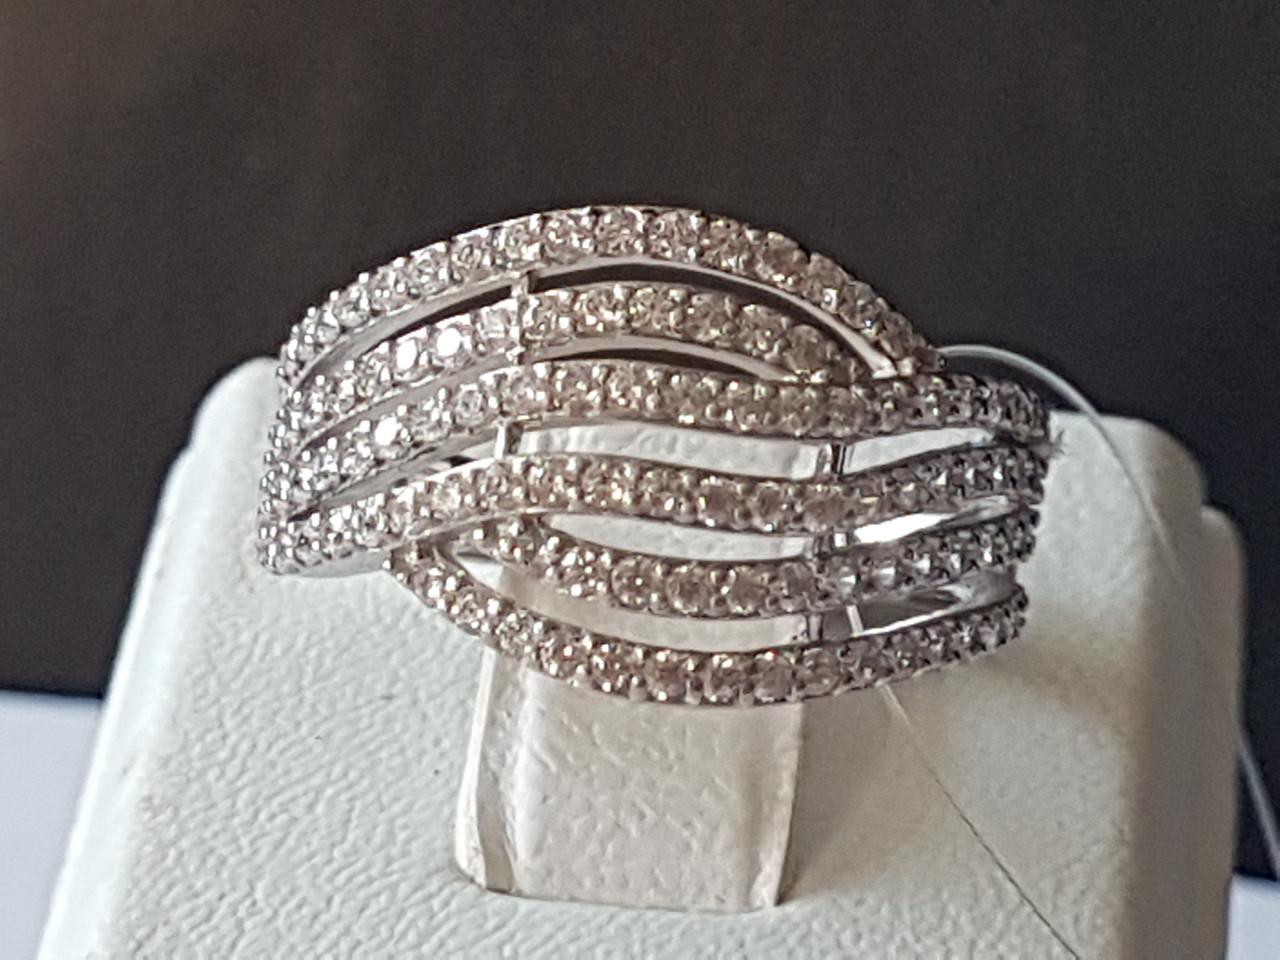 Серебряное кольцо с фианитами. Артикул 901-00340 16